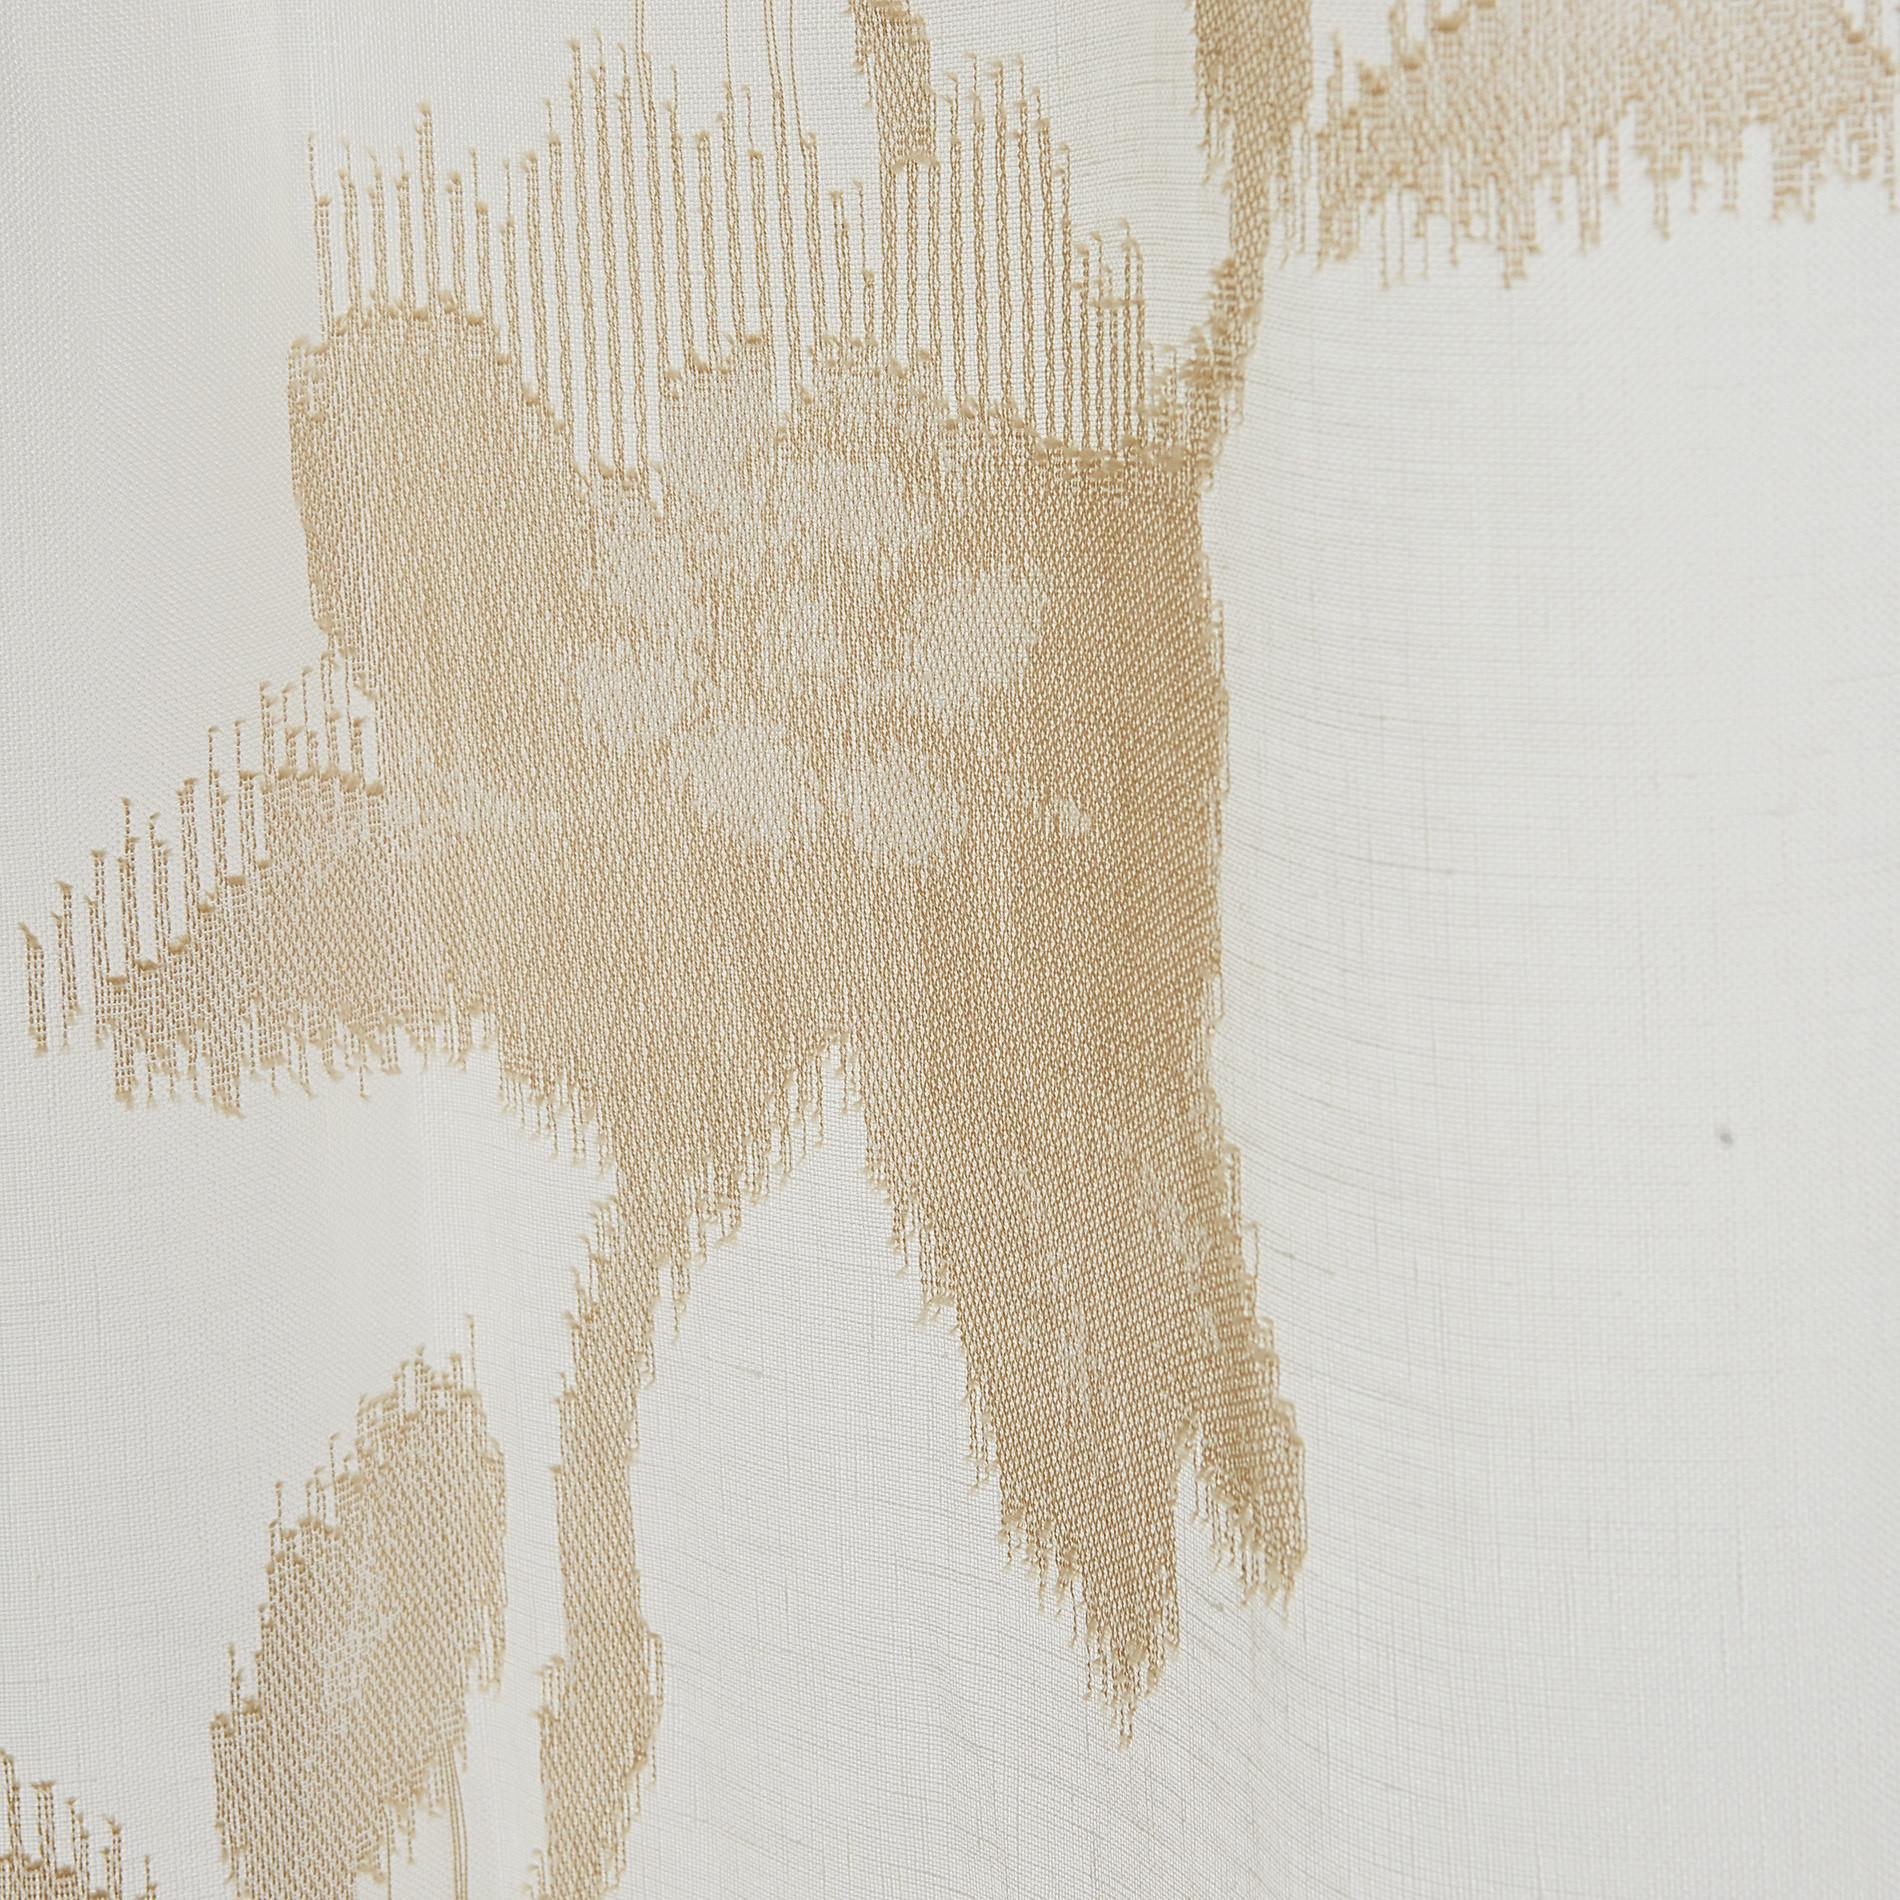 Tenda puro lino ricami floreali, Bianco/Oro, large image number 3